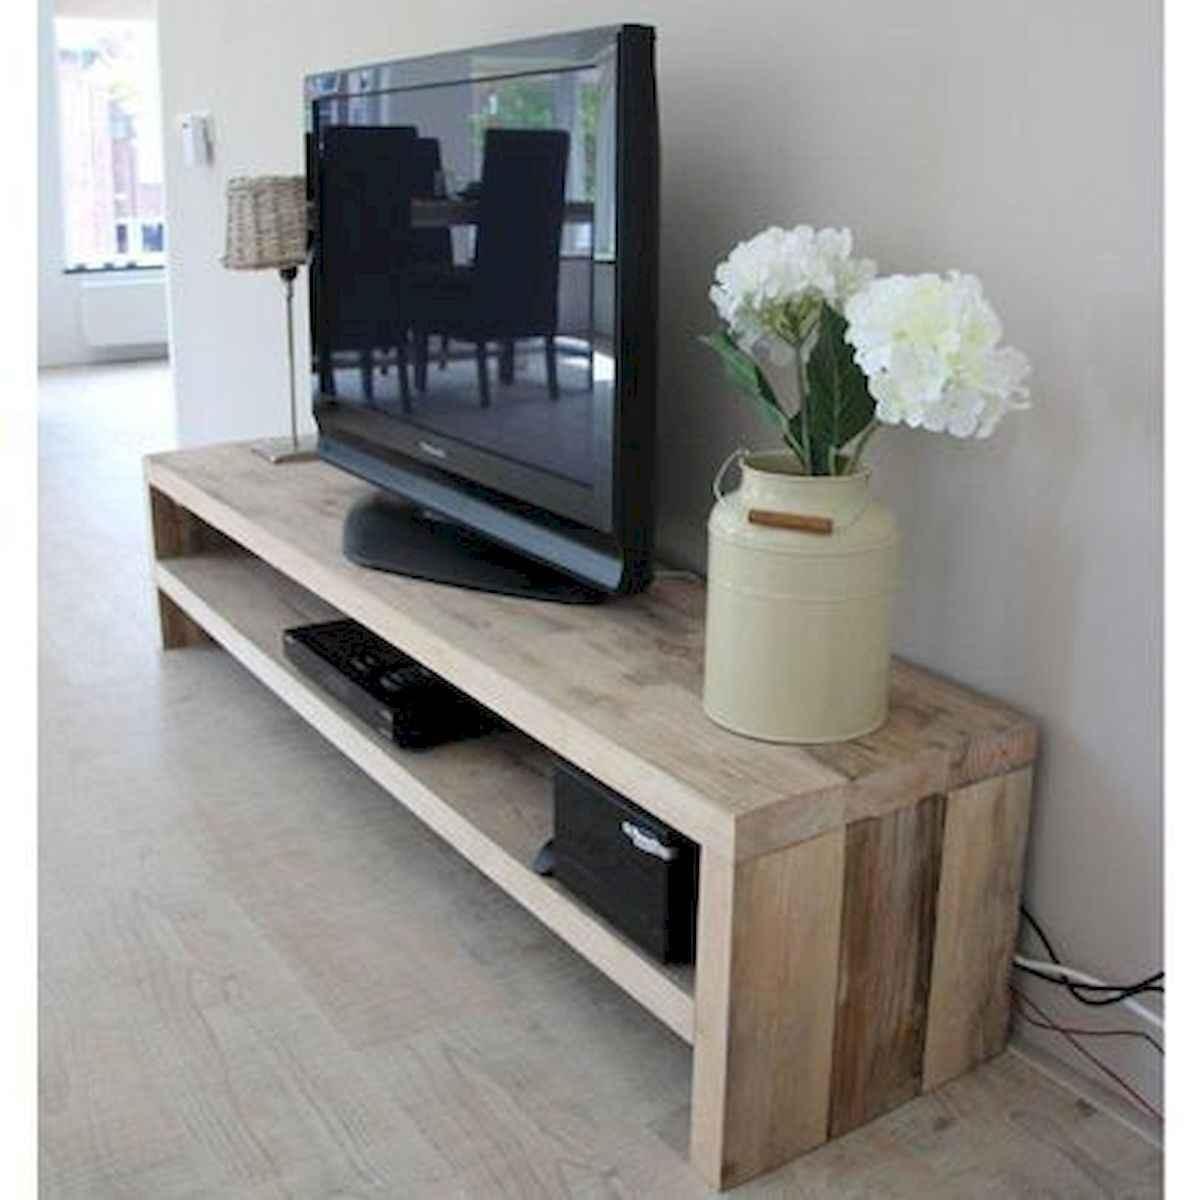 50 Favorite Diy Projects Pallet Tv Stand Plans Design Ideas